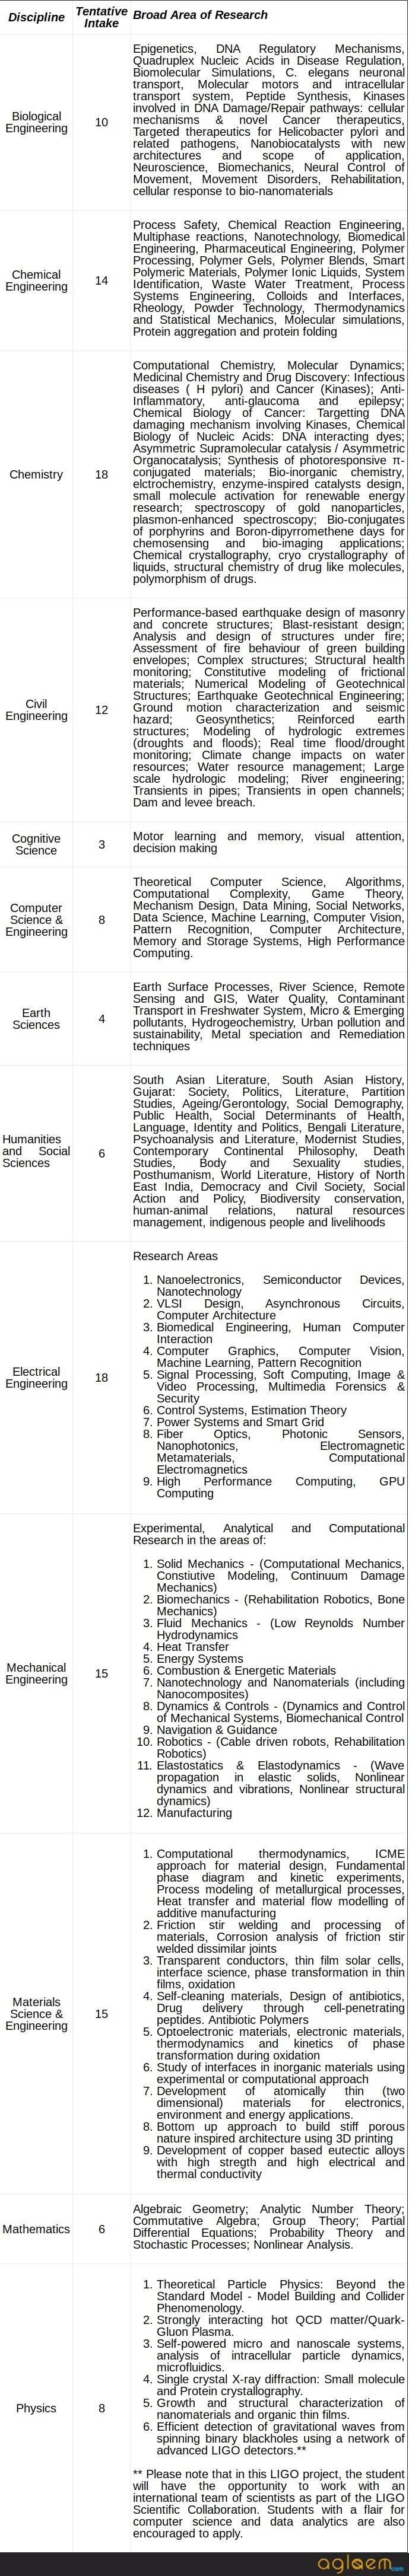 IIT Gandhinagar Ph.D Admission 2018